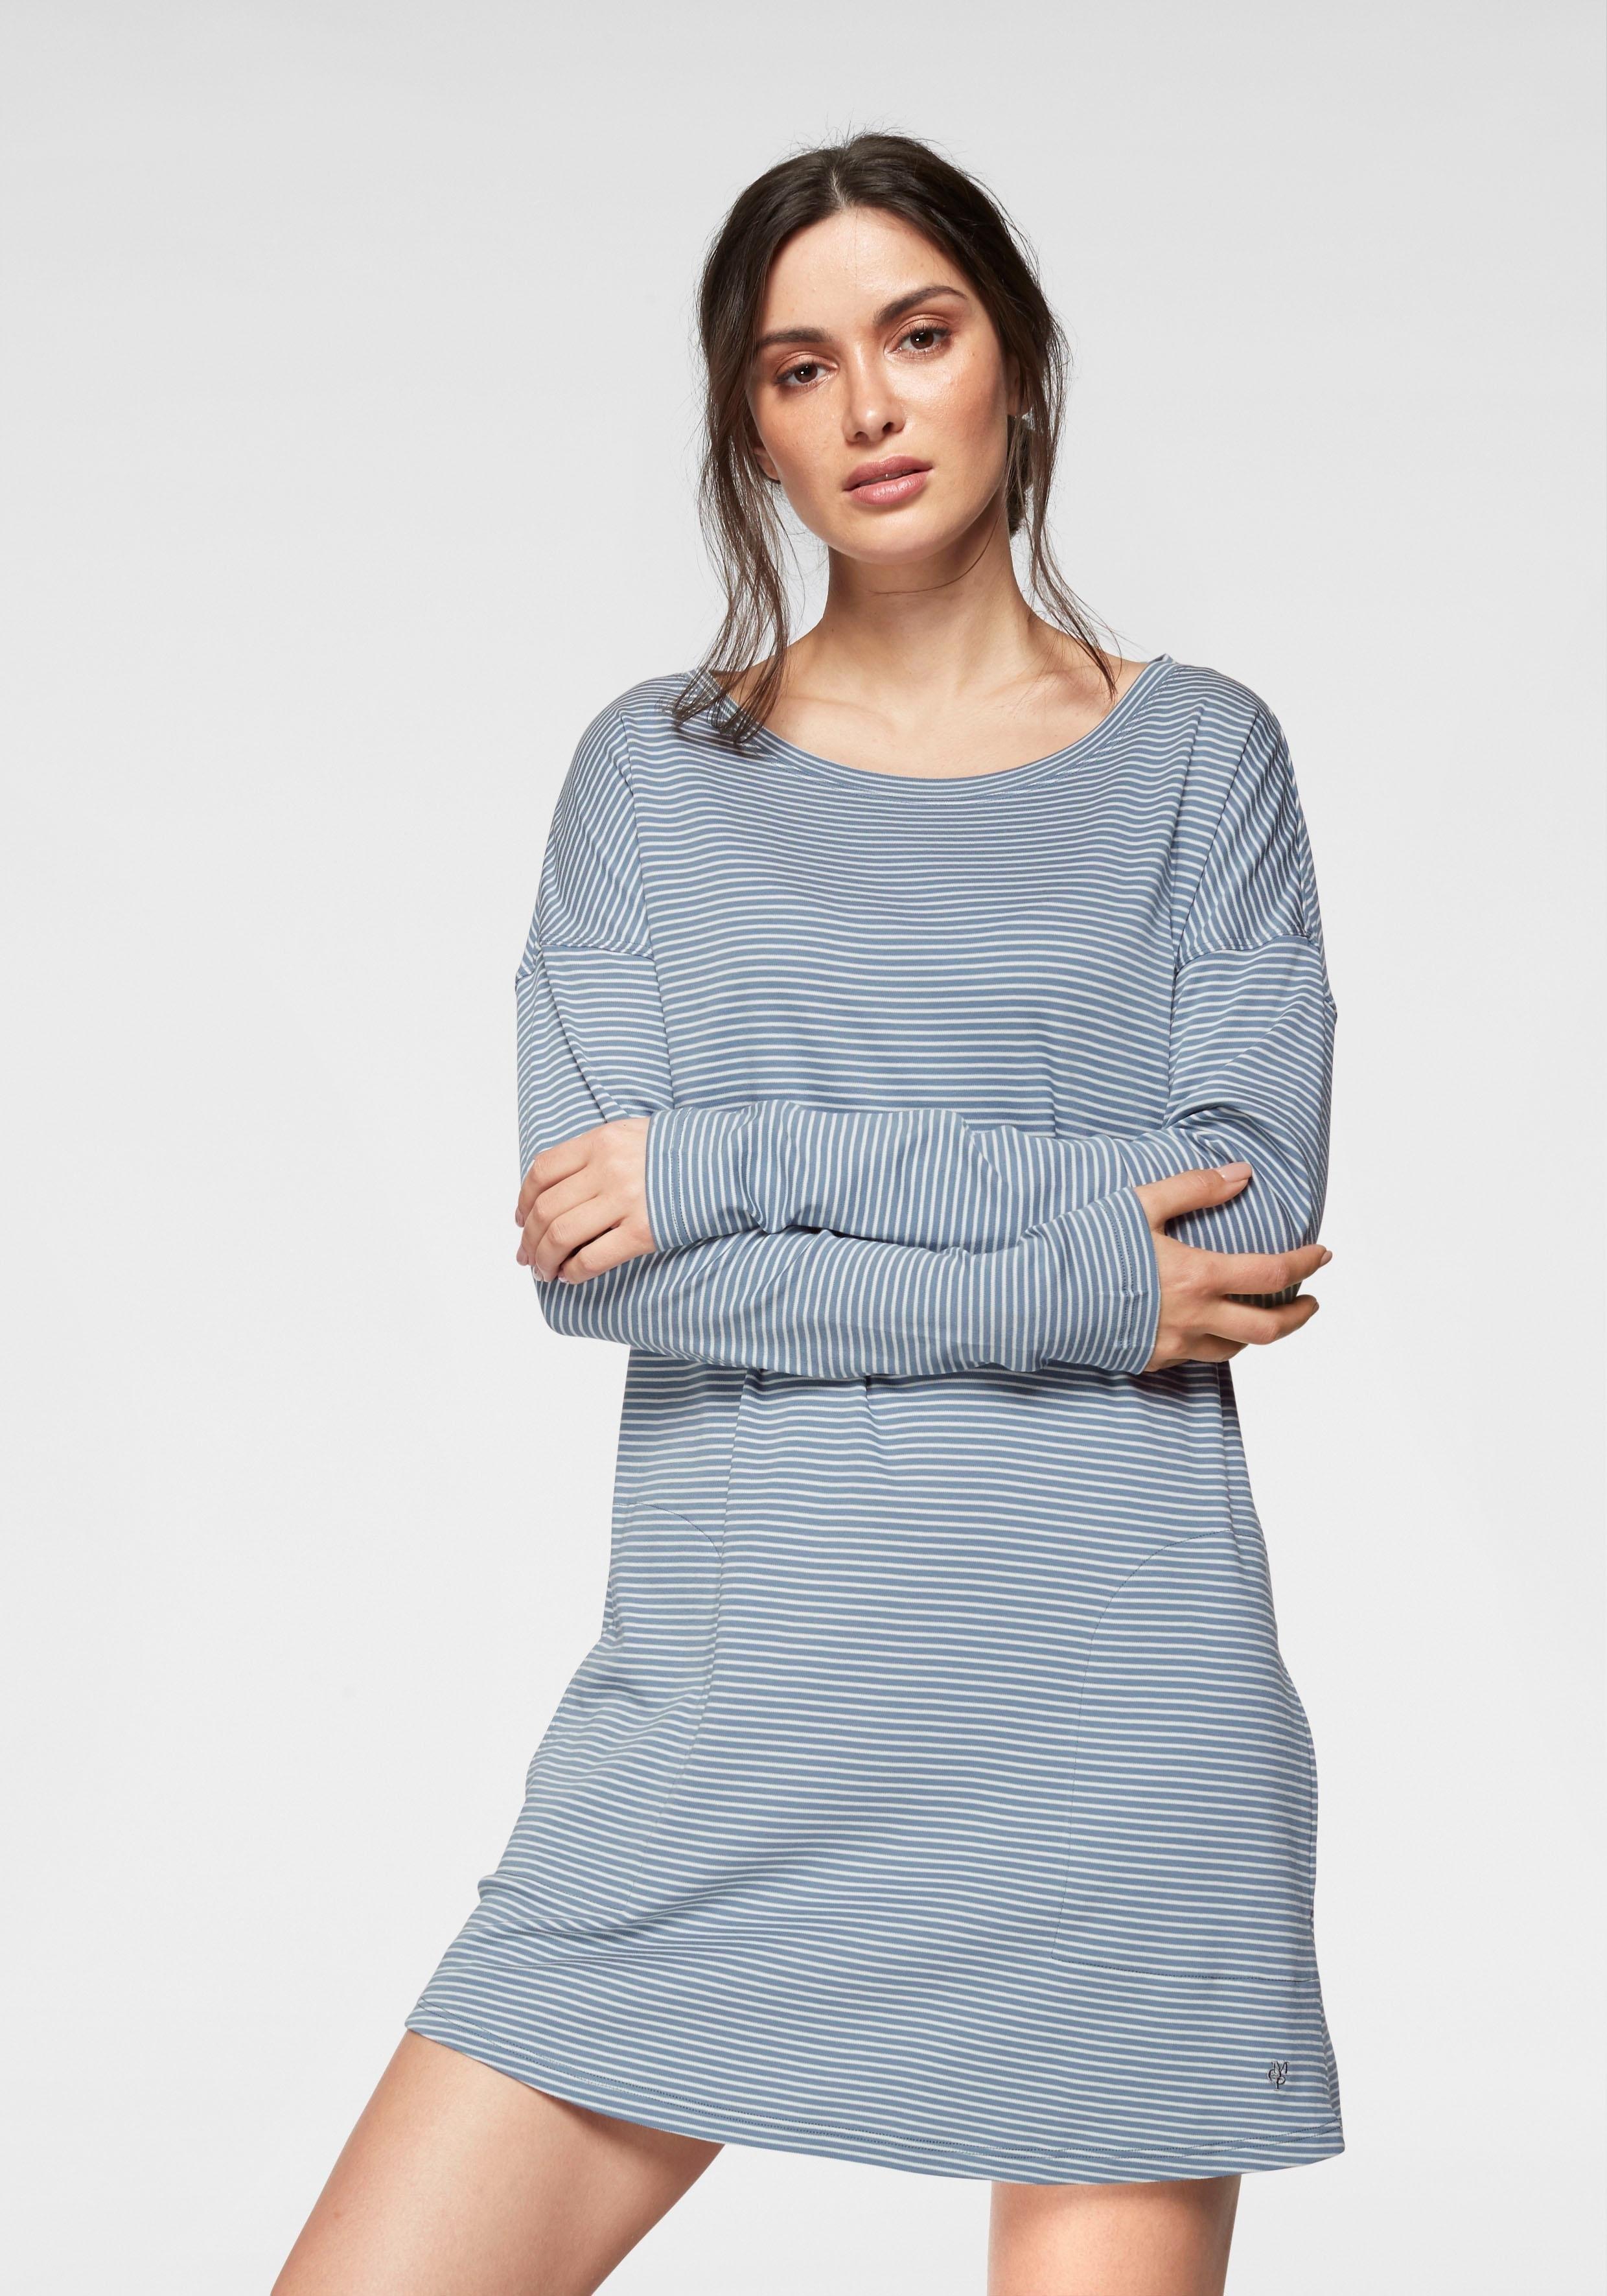 Marc O'Polo nachthemd met stippen in overhemdmodel bij Lascana online kopen